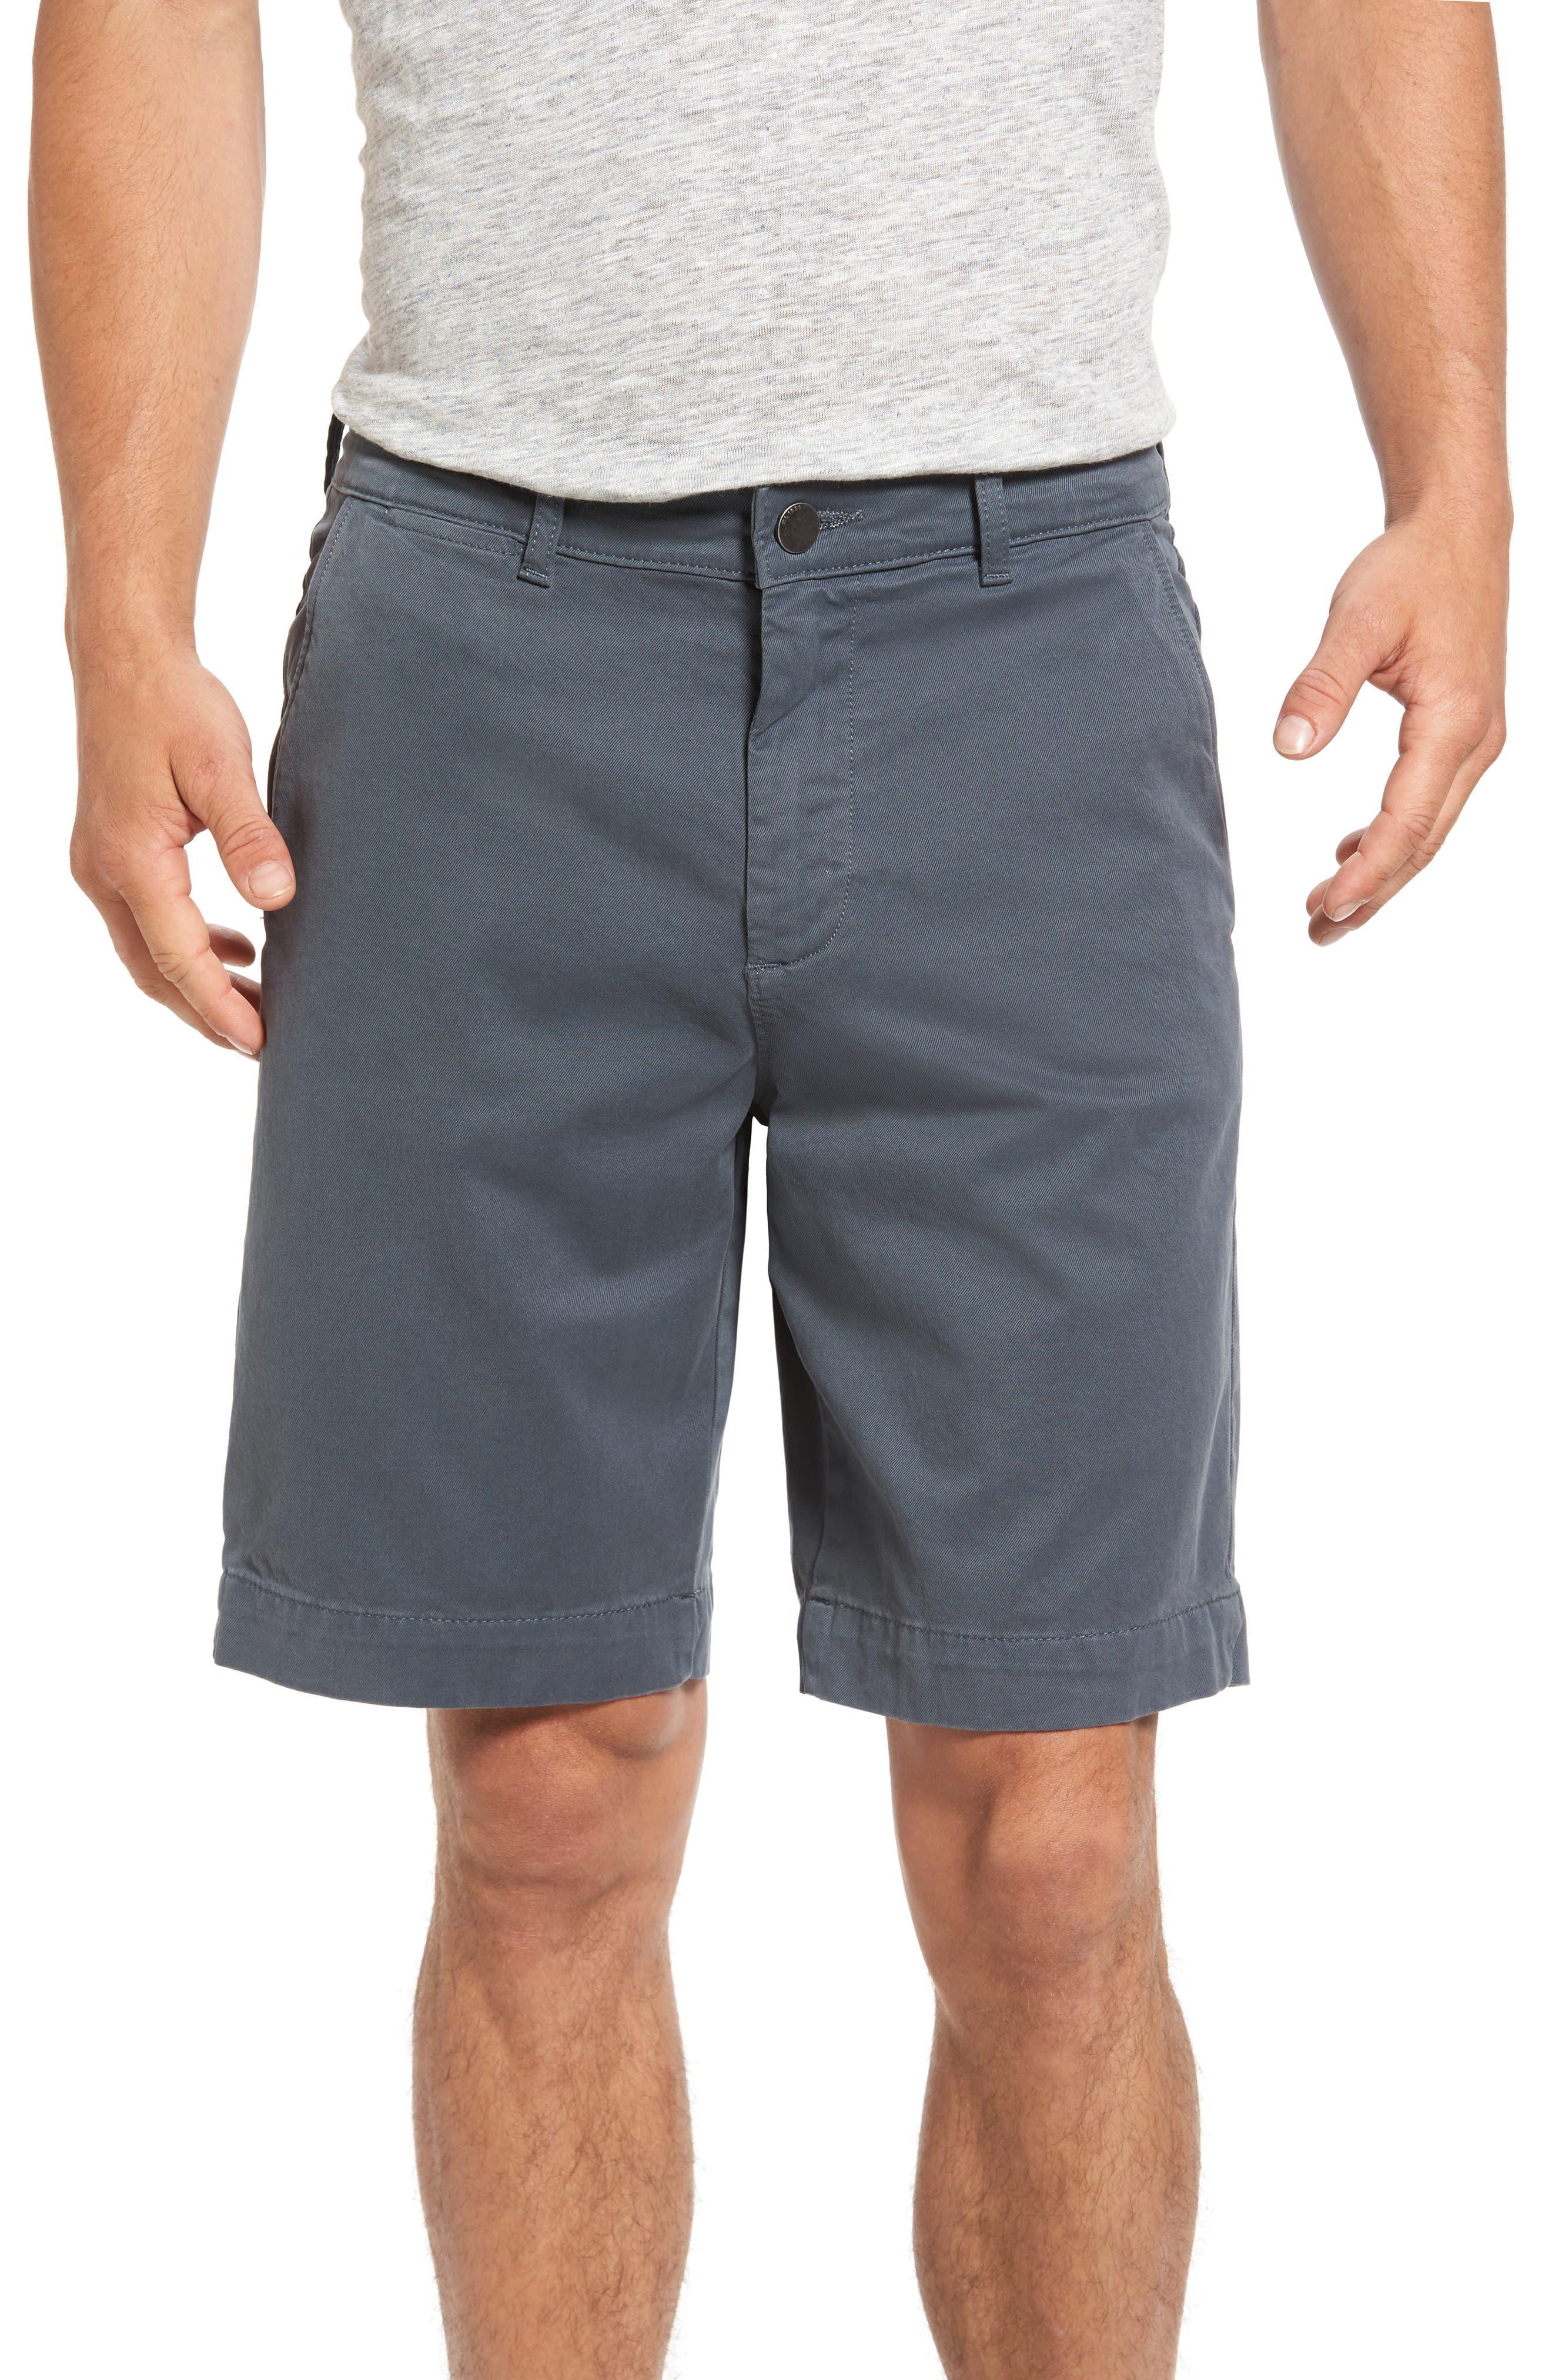 DL1961 Jake Classic Chino Shorts